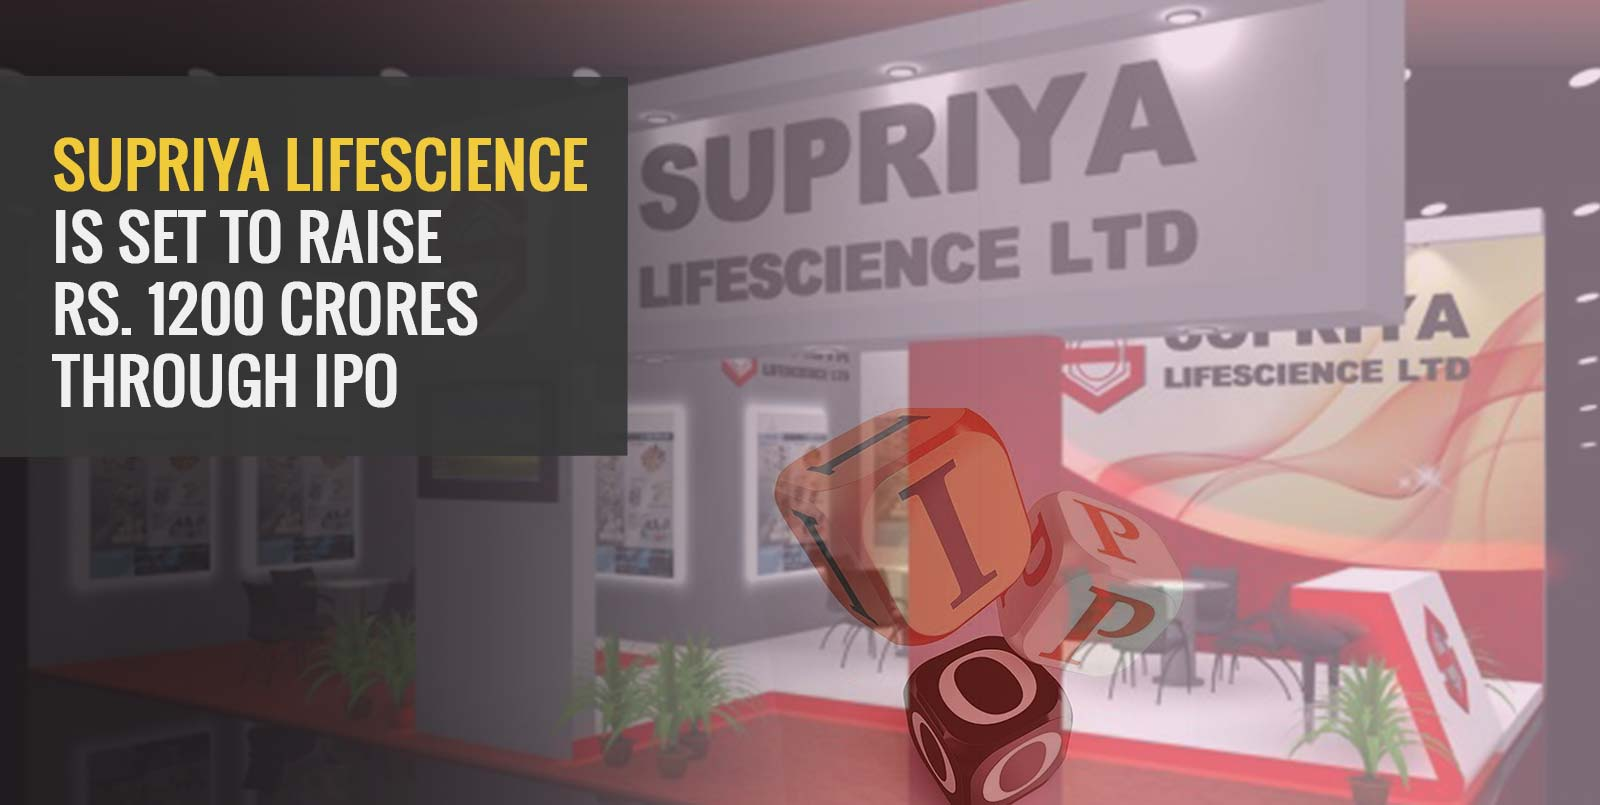 Supriya Lifescience is Set to Raise Rs. 1200 Crores through IPO